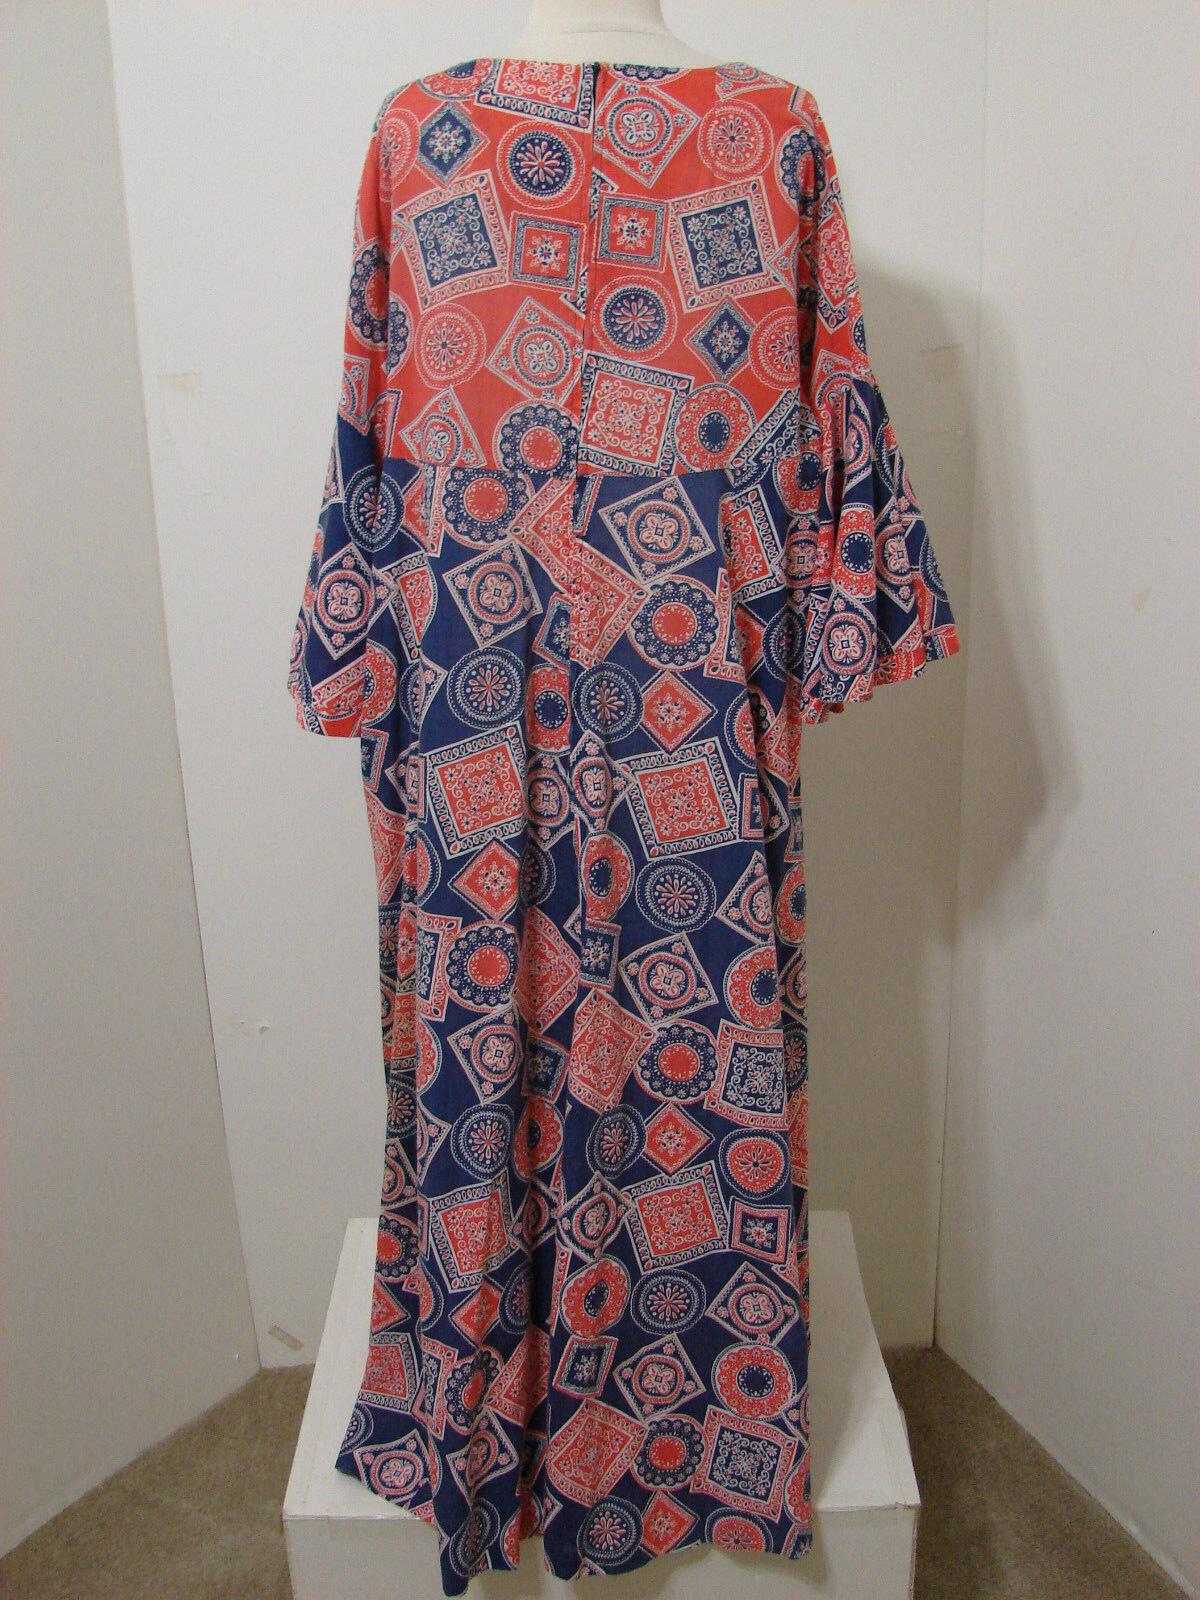 PEGGY LOU Caftan Dress Vintage 1960's Groovy Patc… - image 7